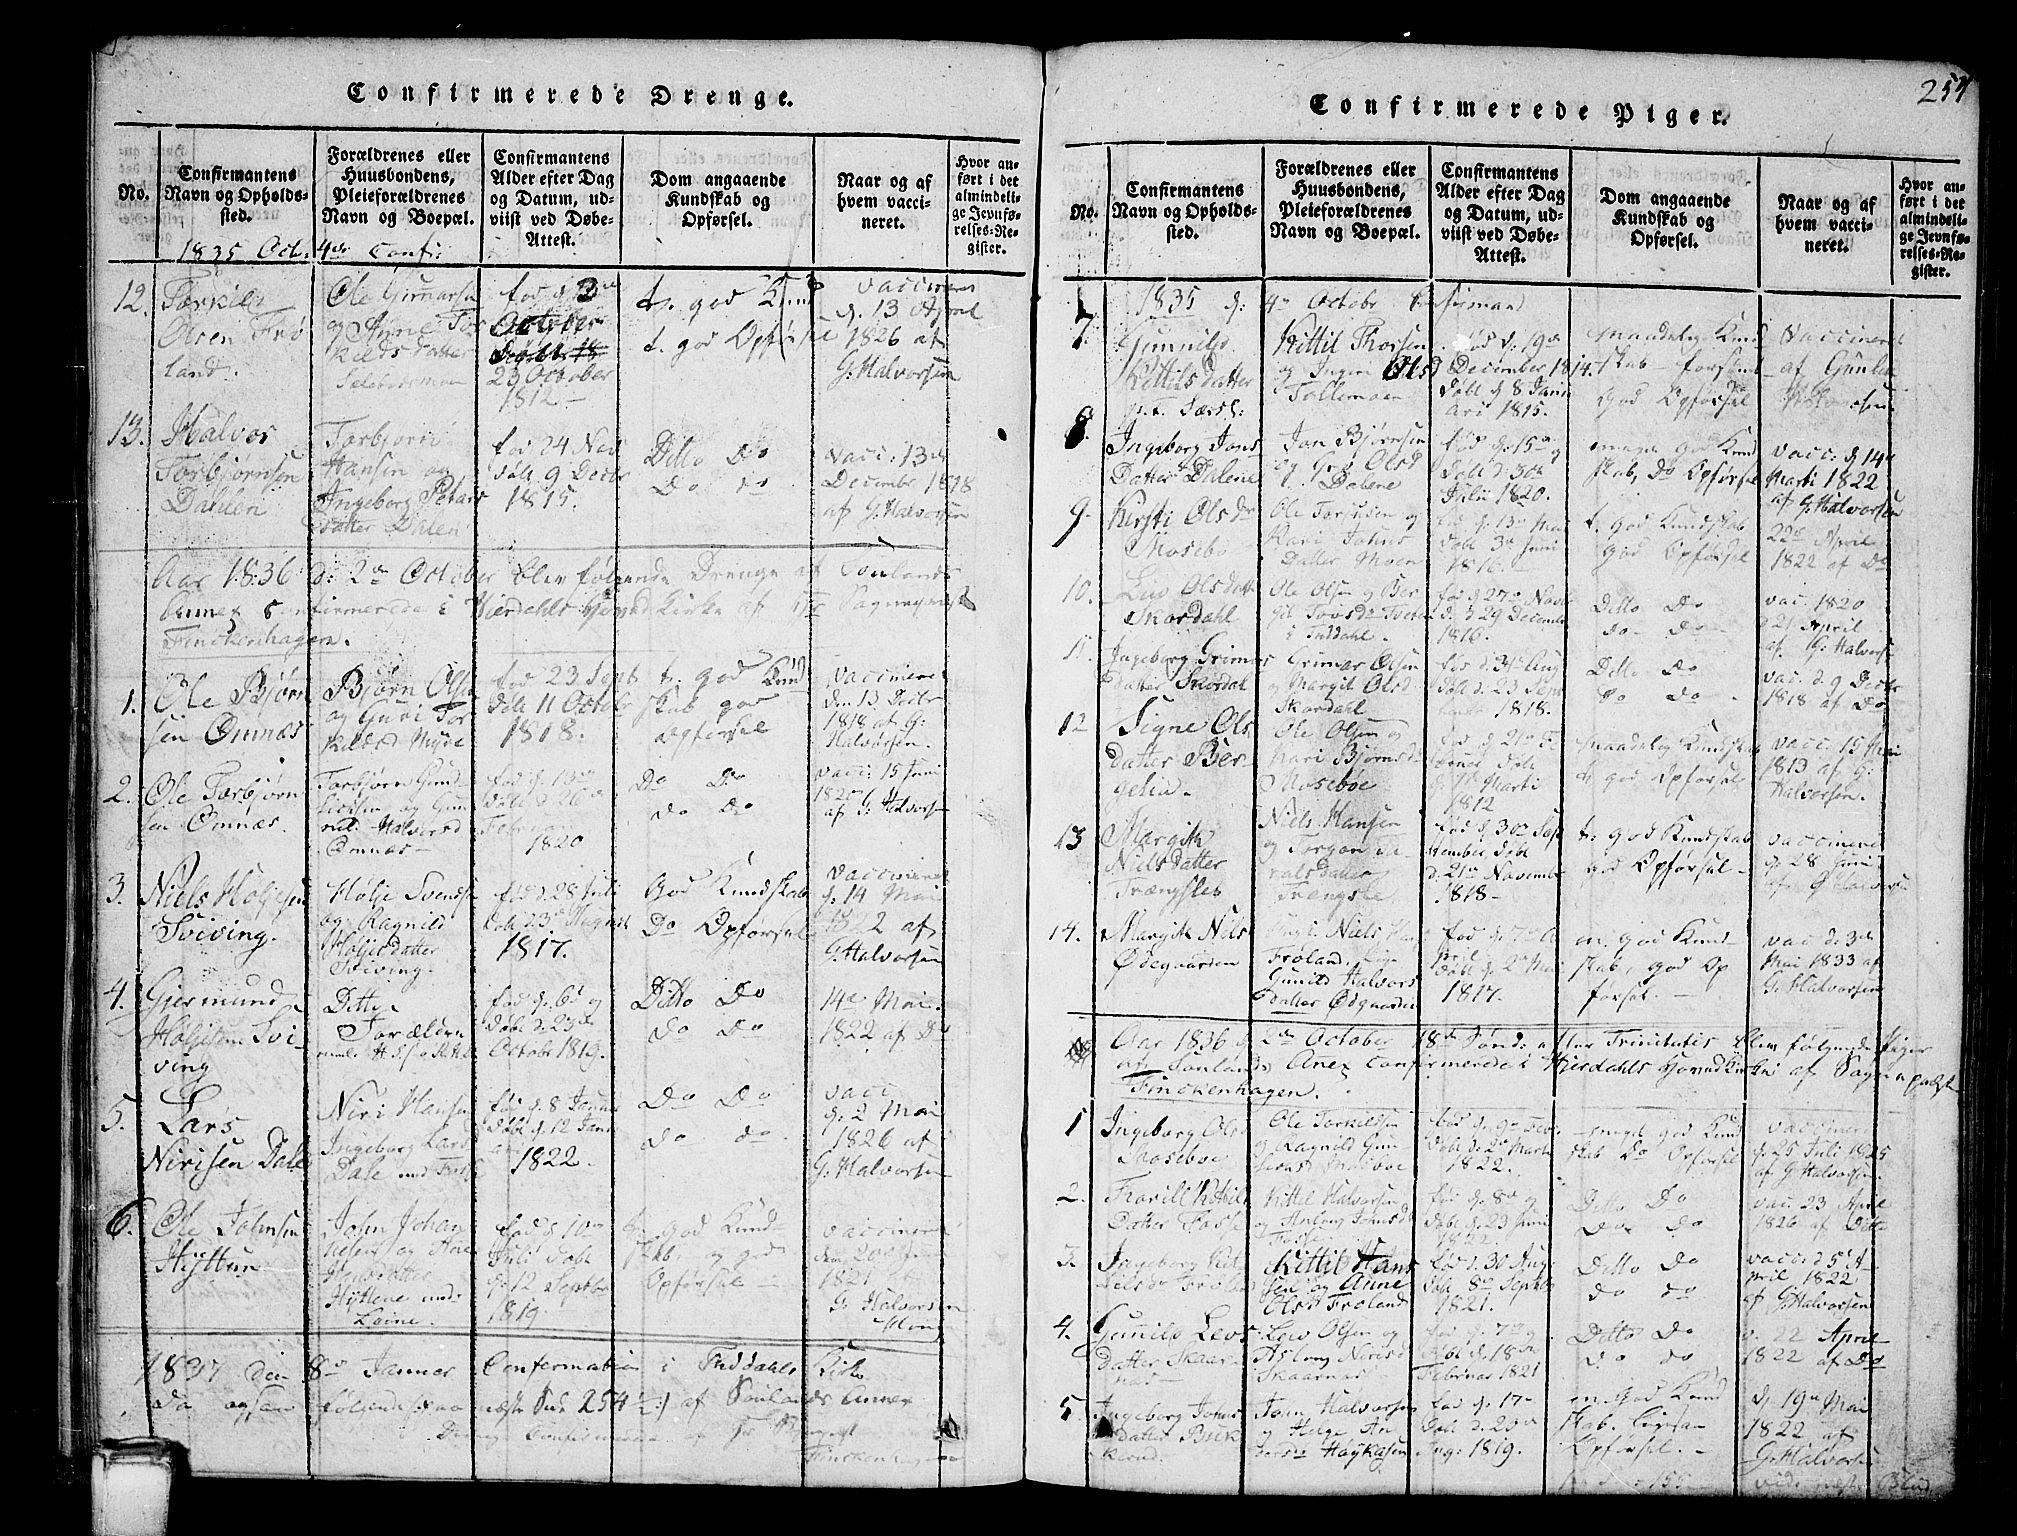 SAKO, Hjartdal kirkebøker, G/Gb/L0001: Klokkerbok nr. II 1, 1815-1842, s. 254